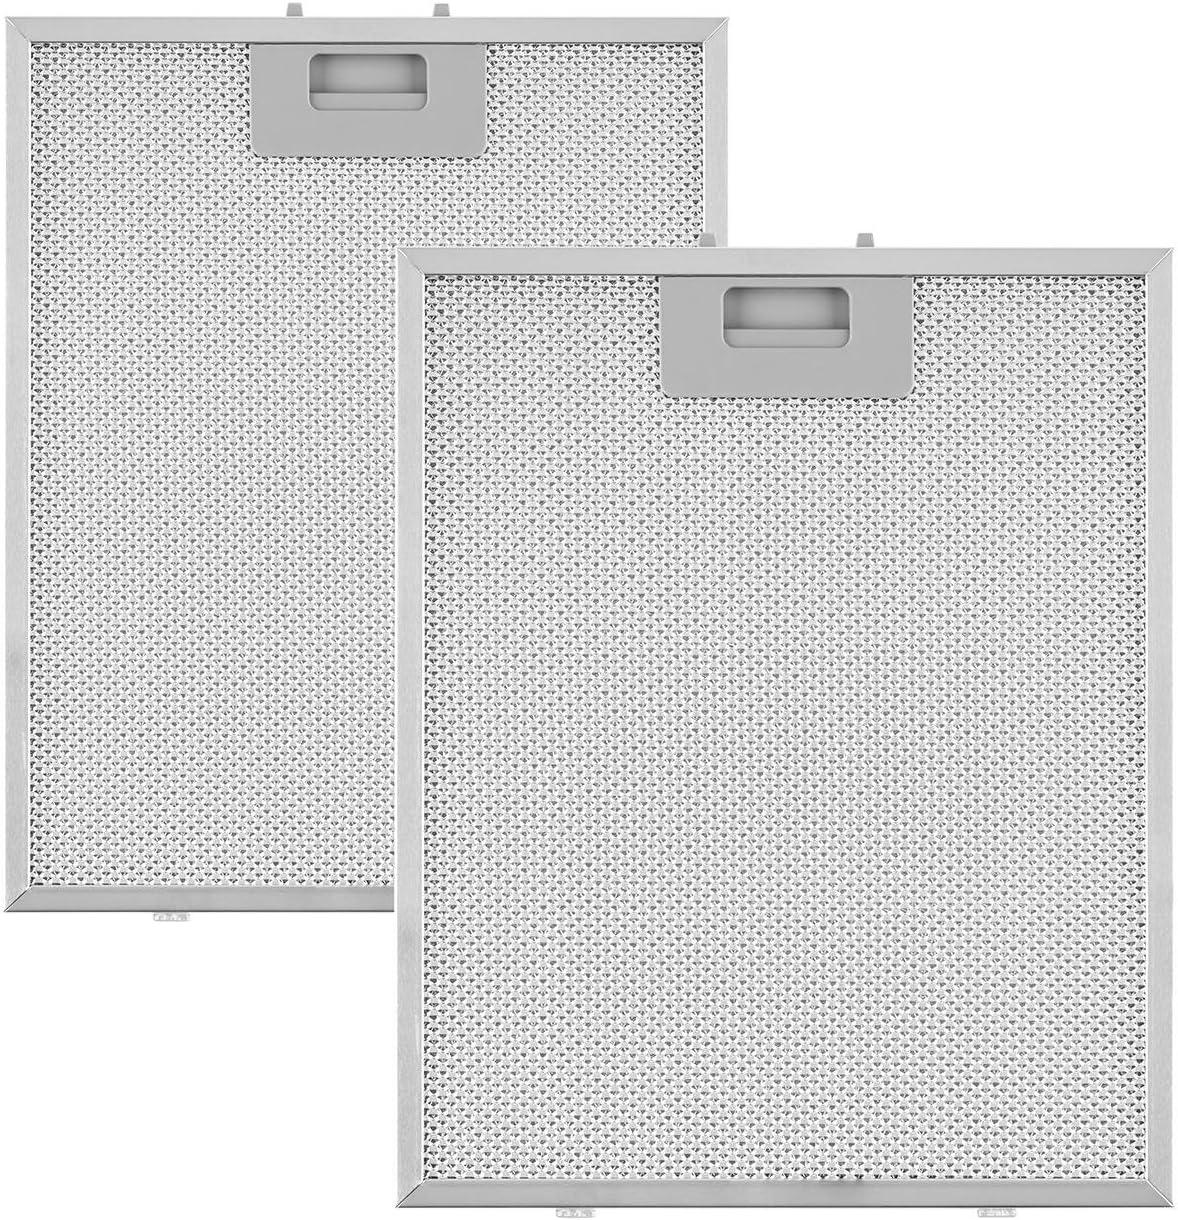 Klarstein Sabia filtro anti grasa aluminio reemplazo accesorio campana extractora 23,8 x 31,8 cm